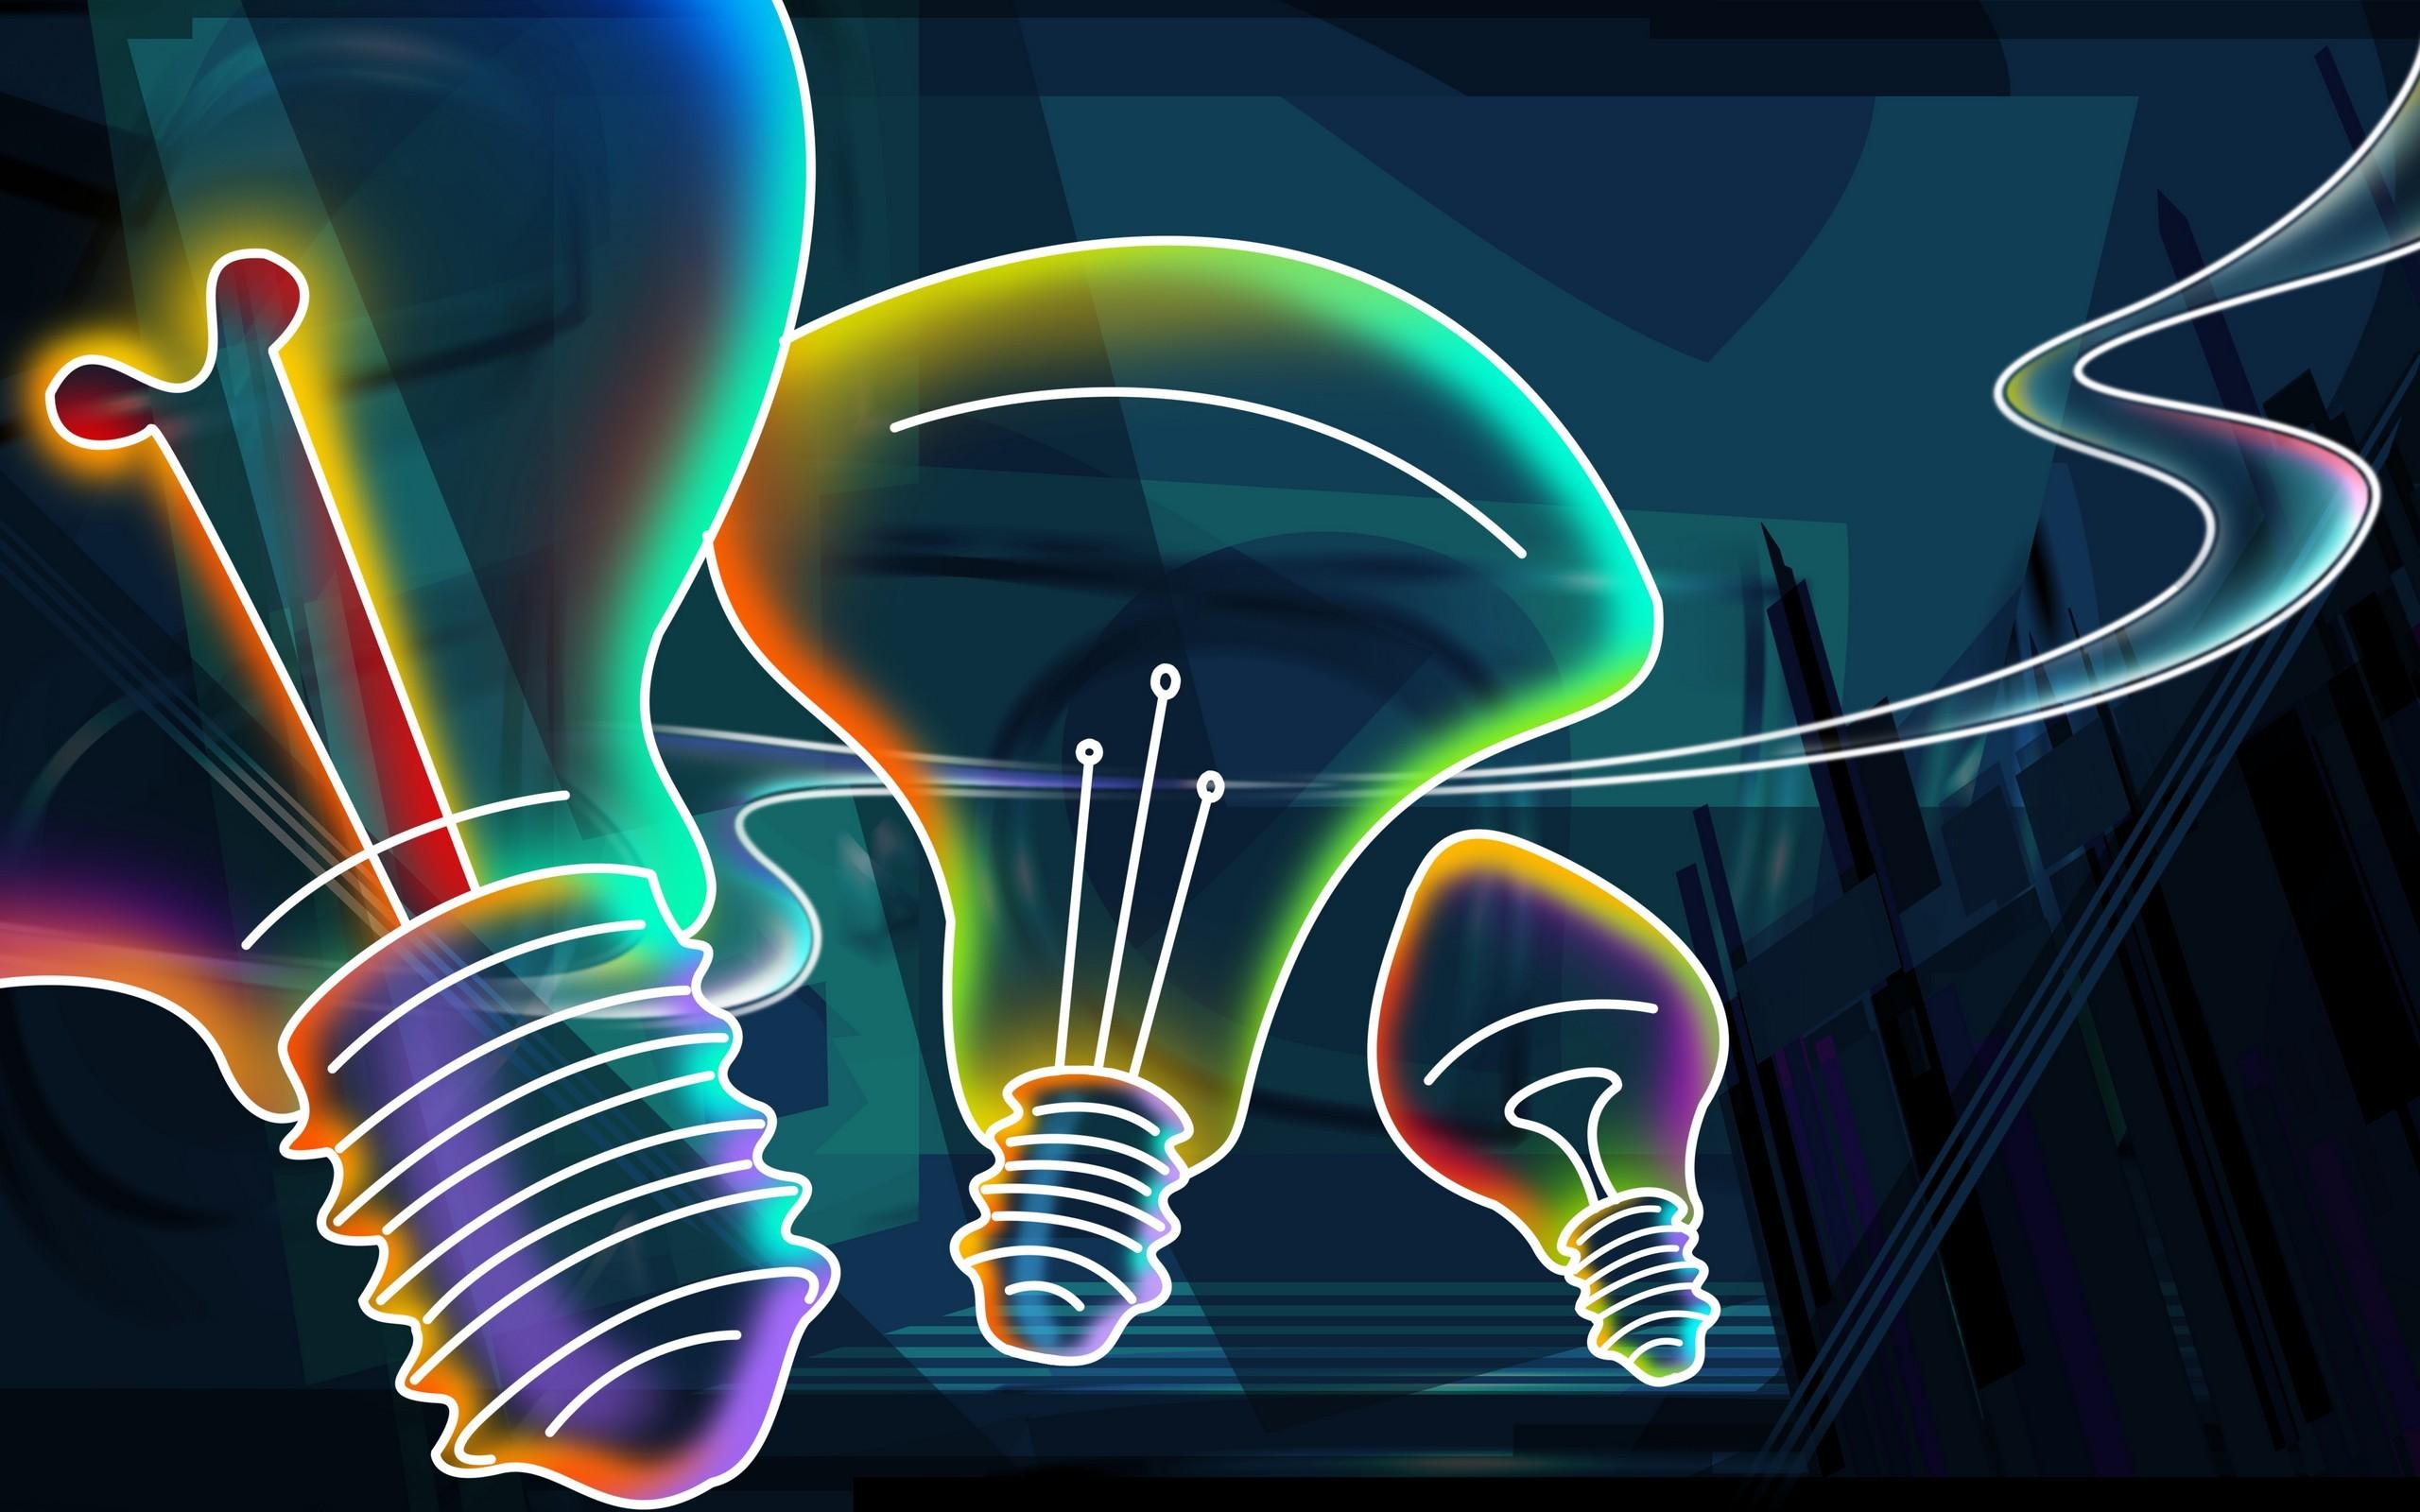 Res: 2560x1600, Neon Color Image Wallpaper